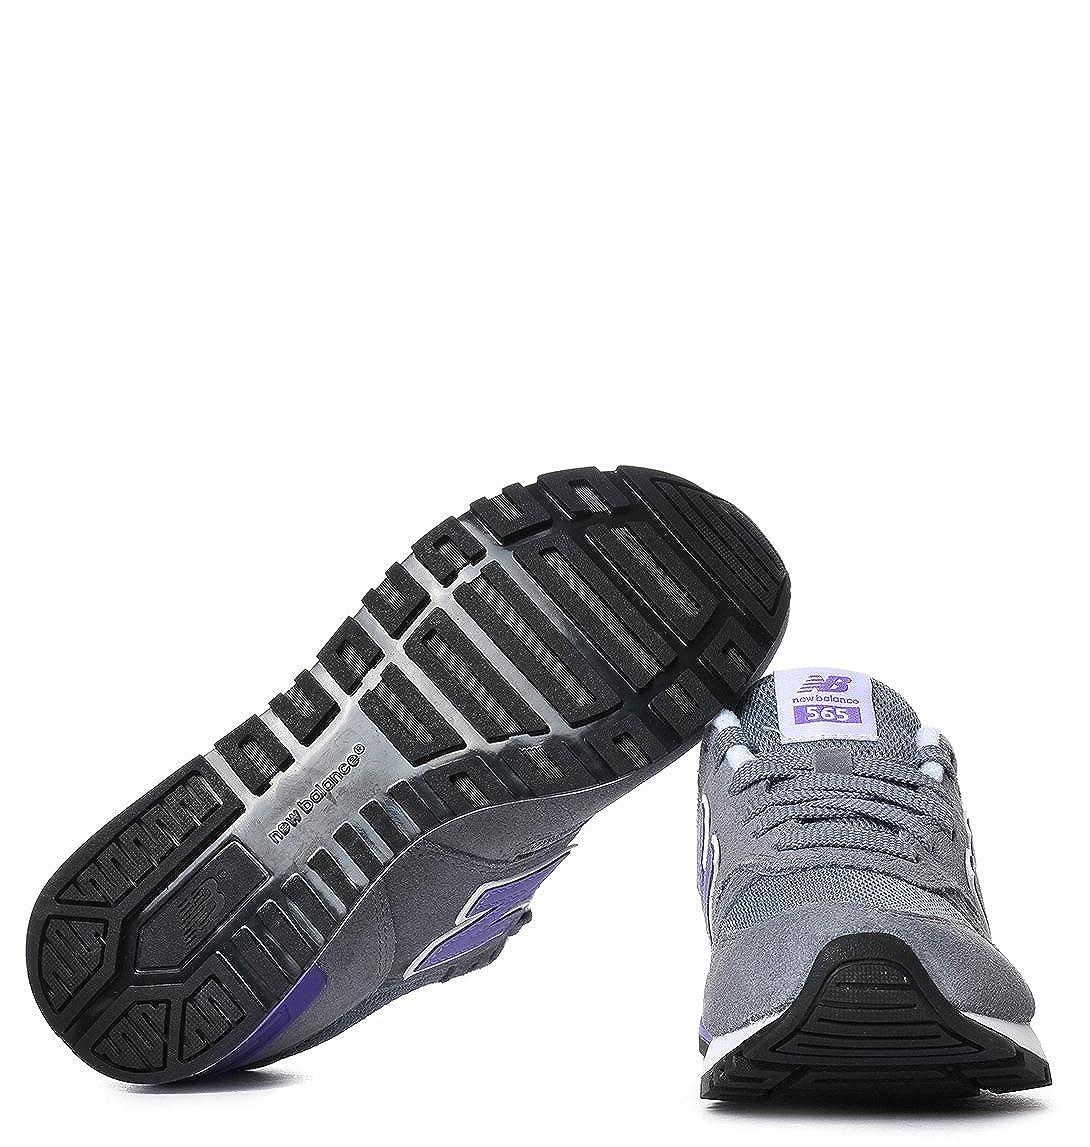 New Balance Femme NBWL565GLWB12 Gris Tissu Baskets: Amazon